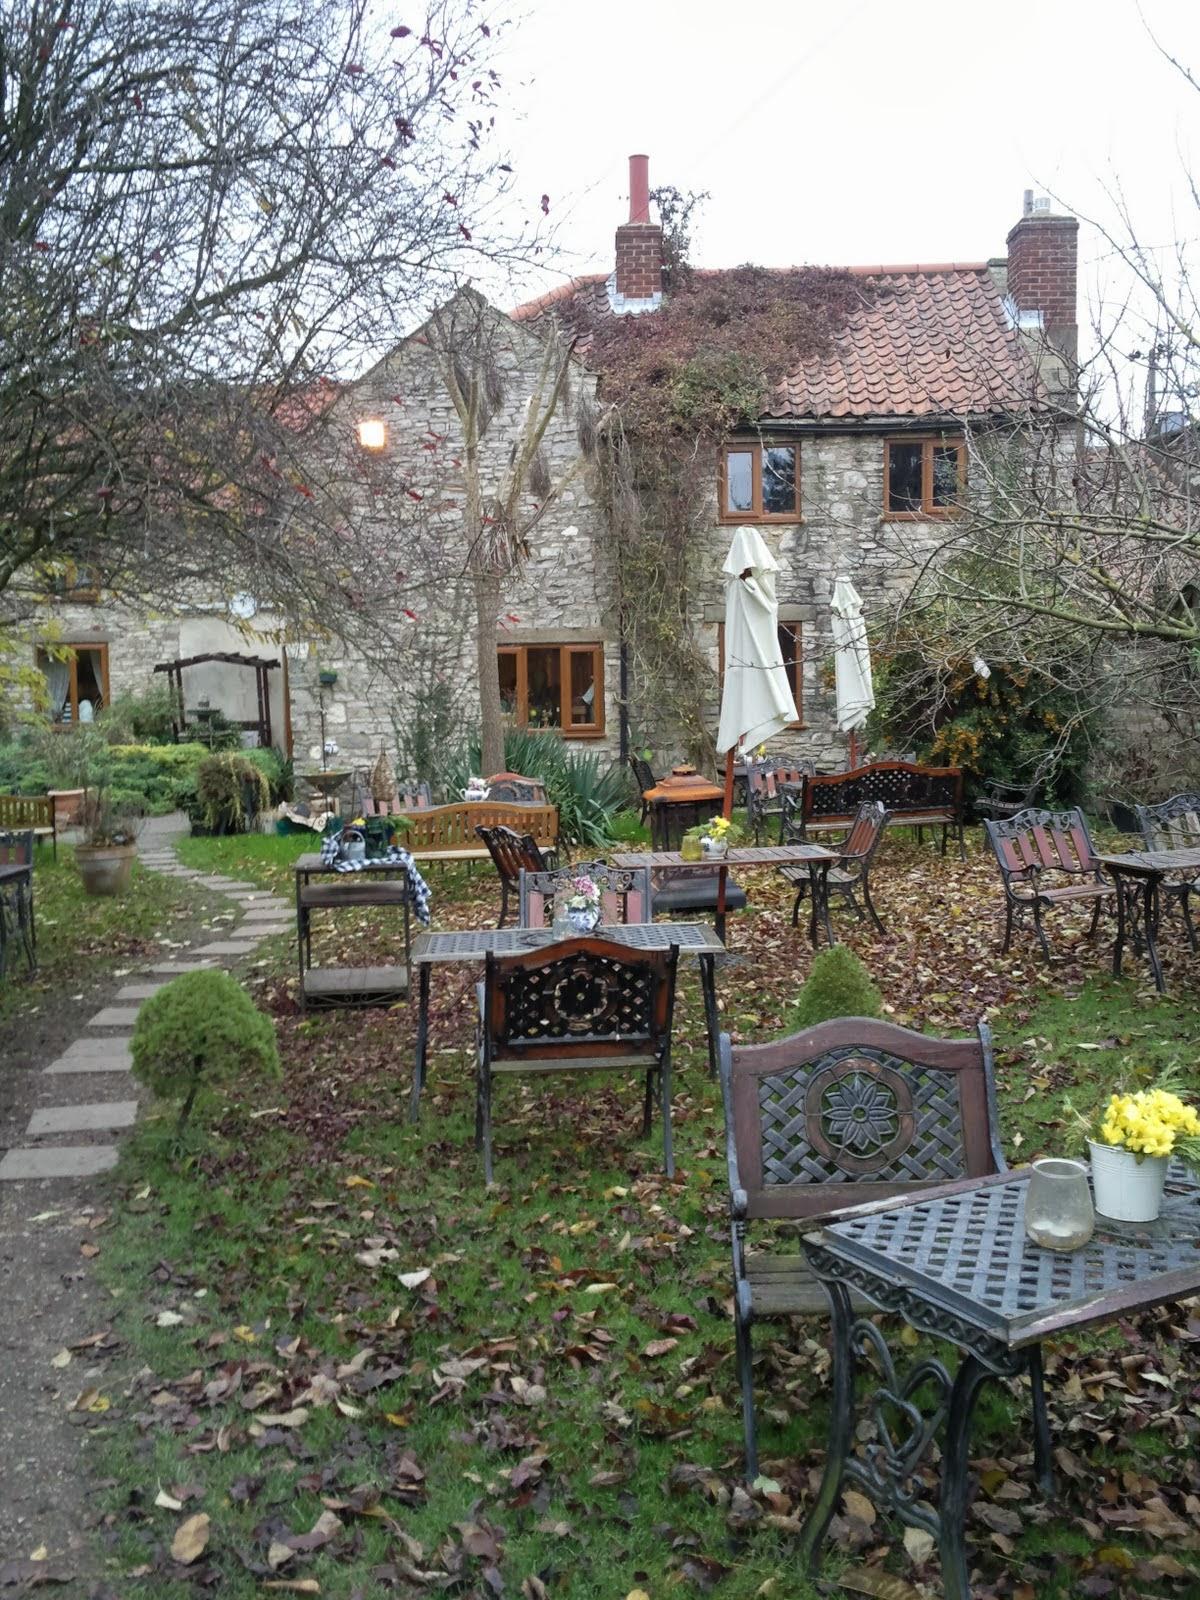 Afternoon Tea and Me: Mill Farm Tea Room - South Milford